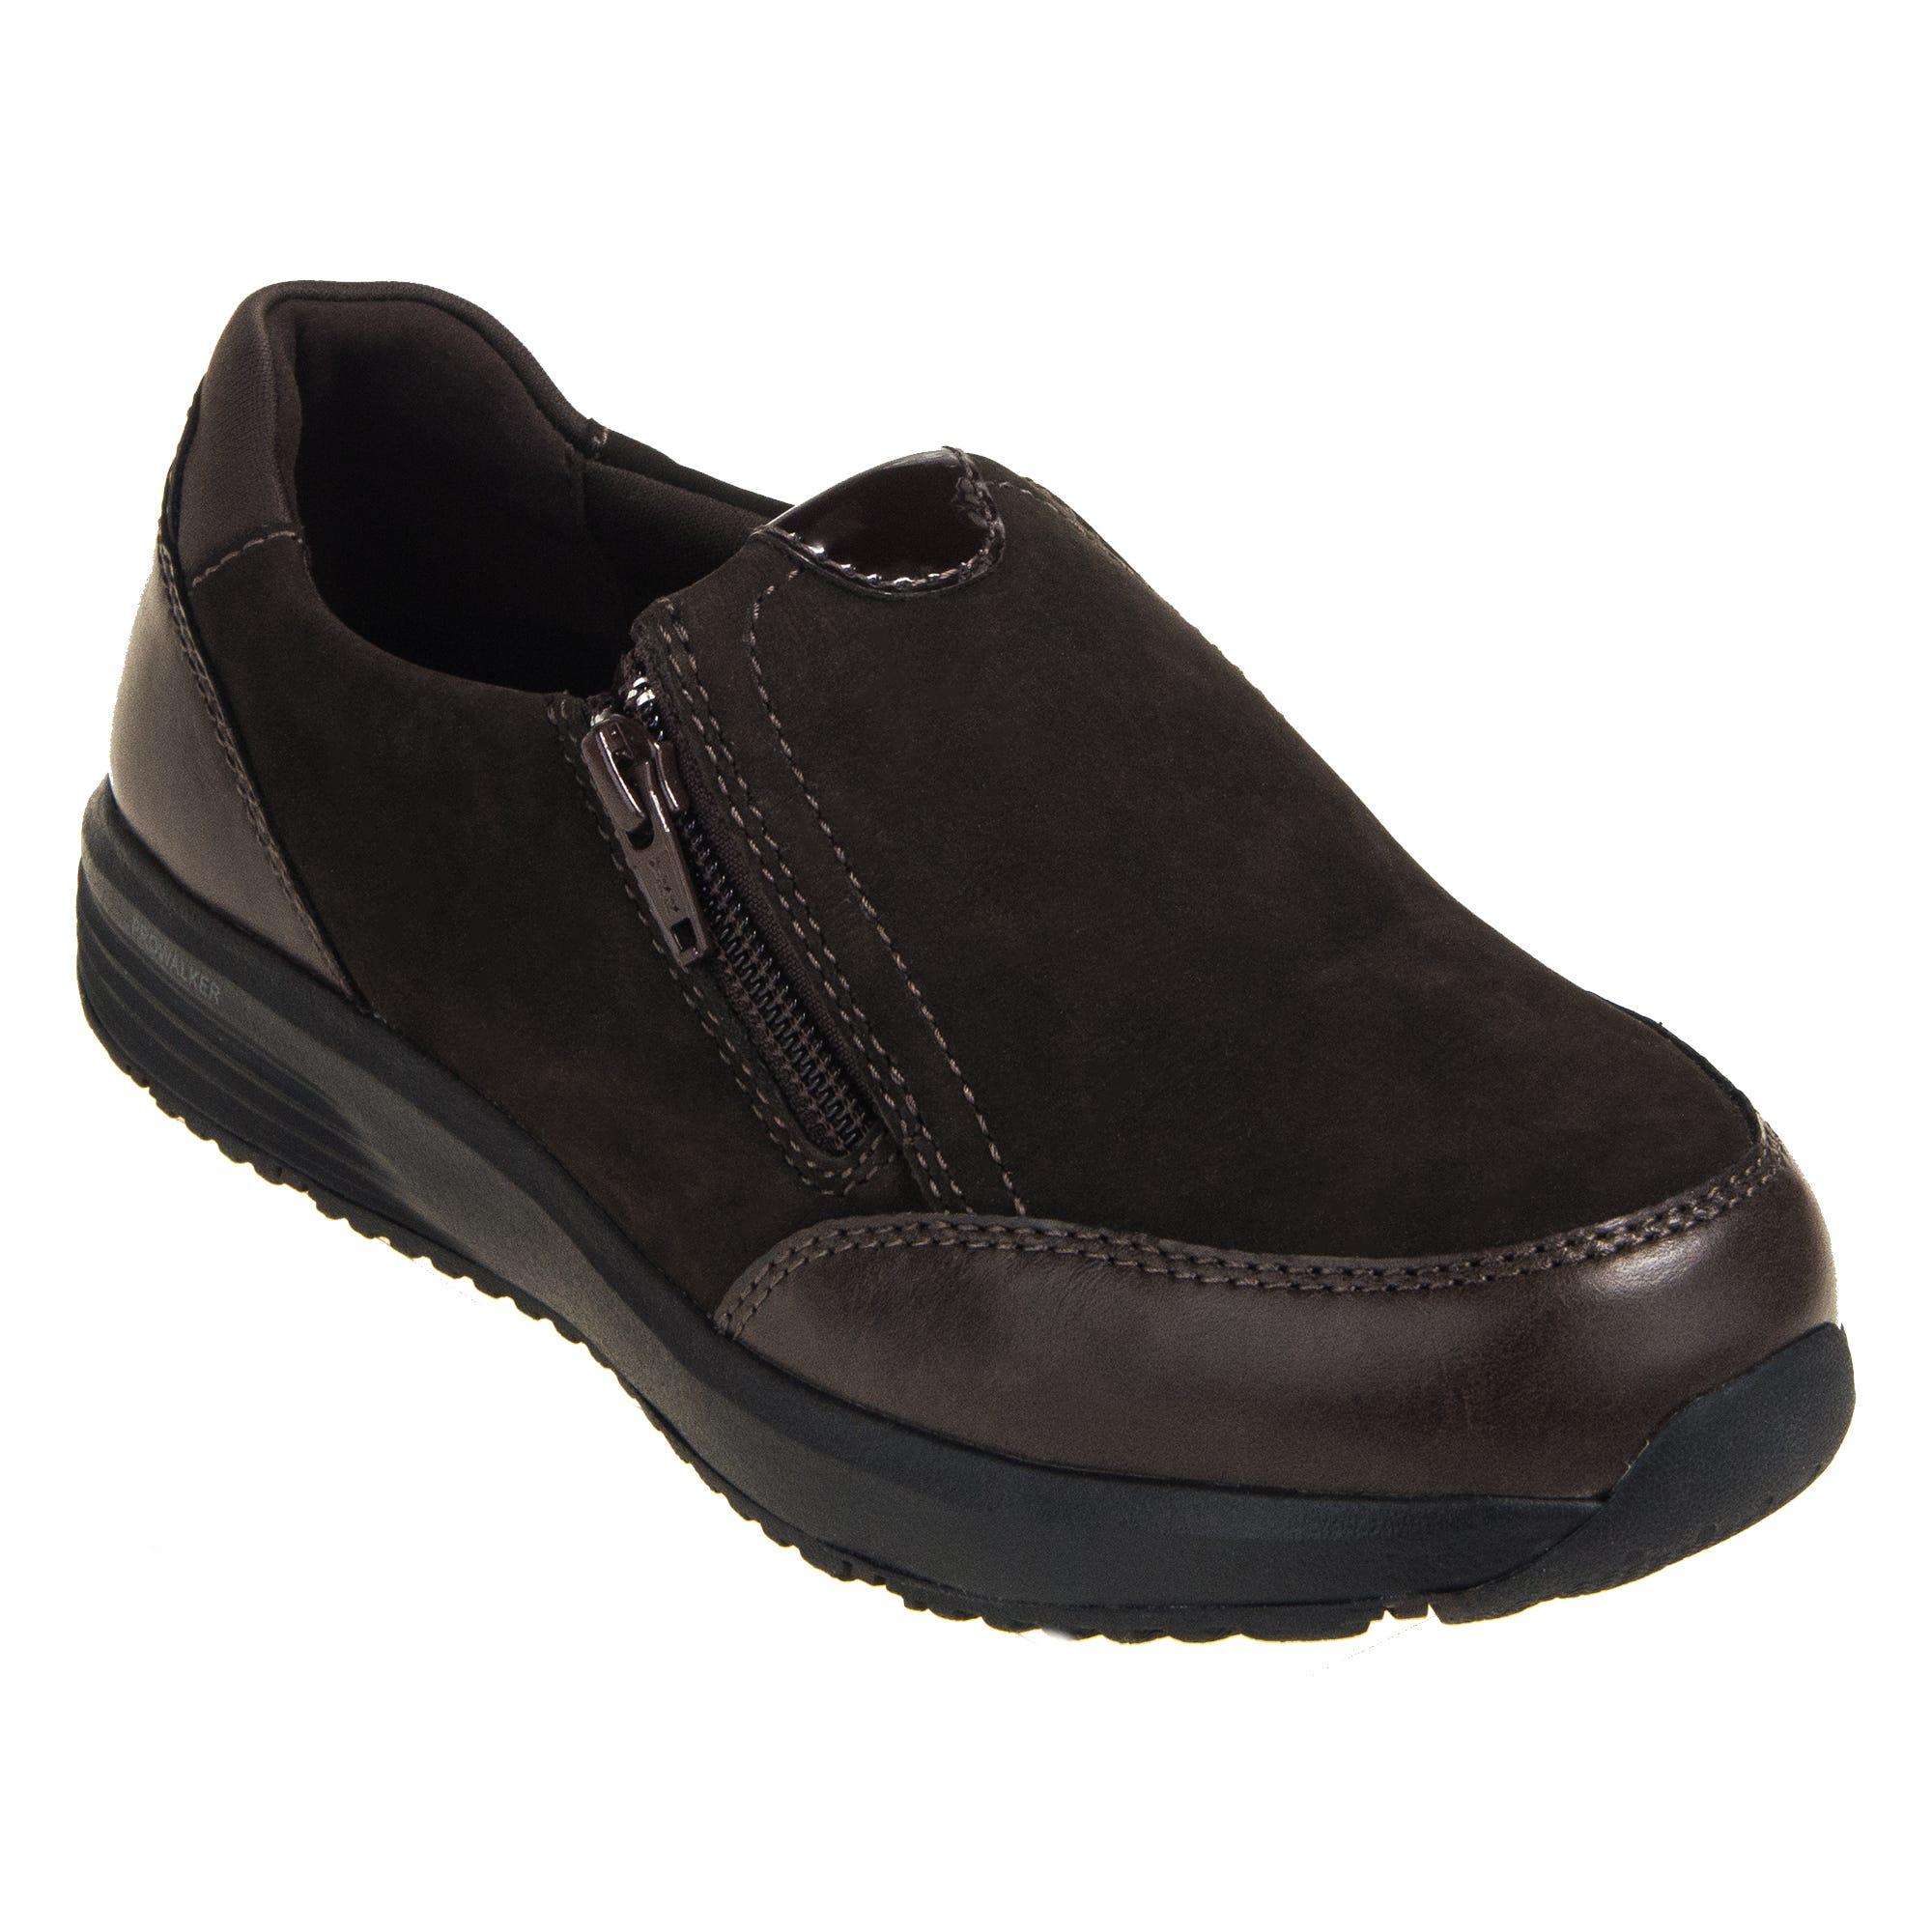 Rockport Trustride Women's Brown EH Steel Toe Side Zip Slip-On RK501 Work Oxfords